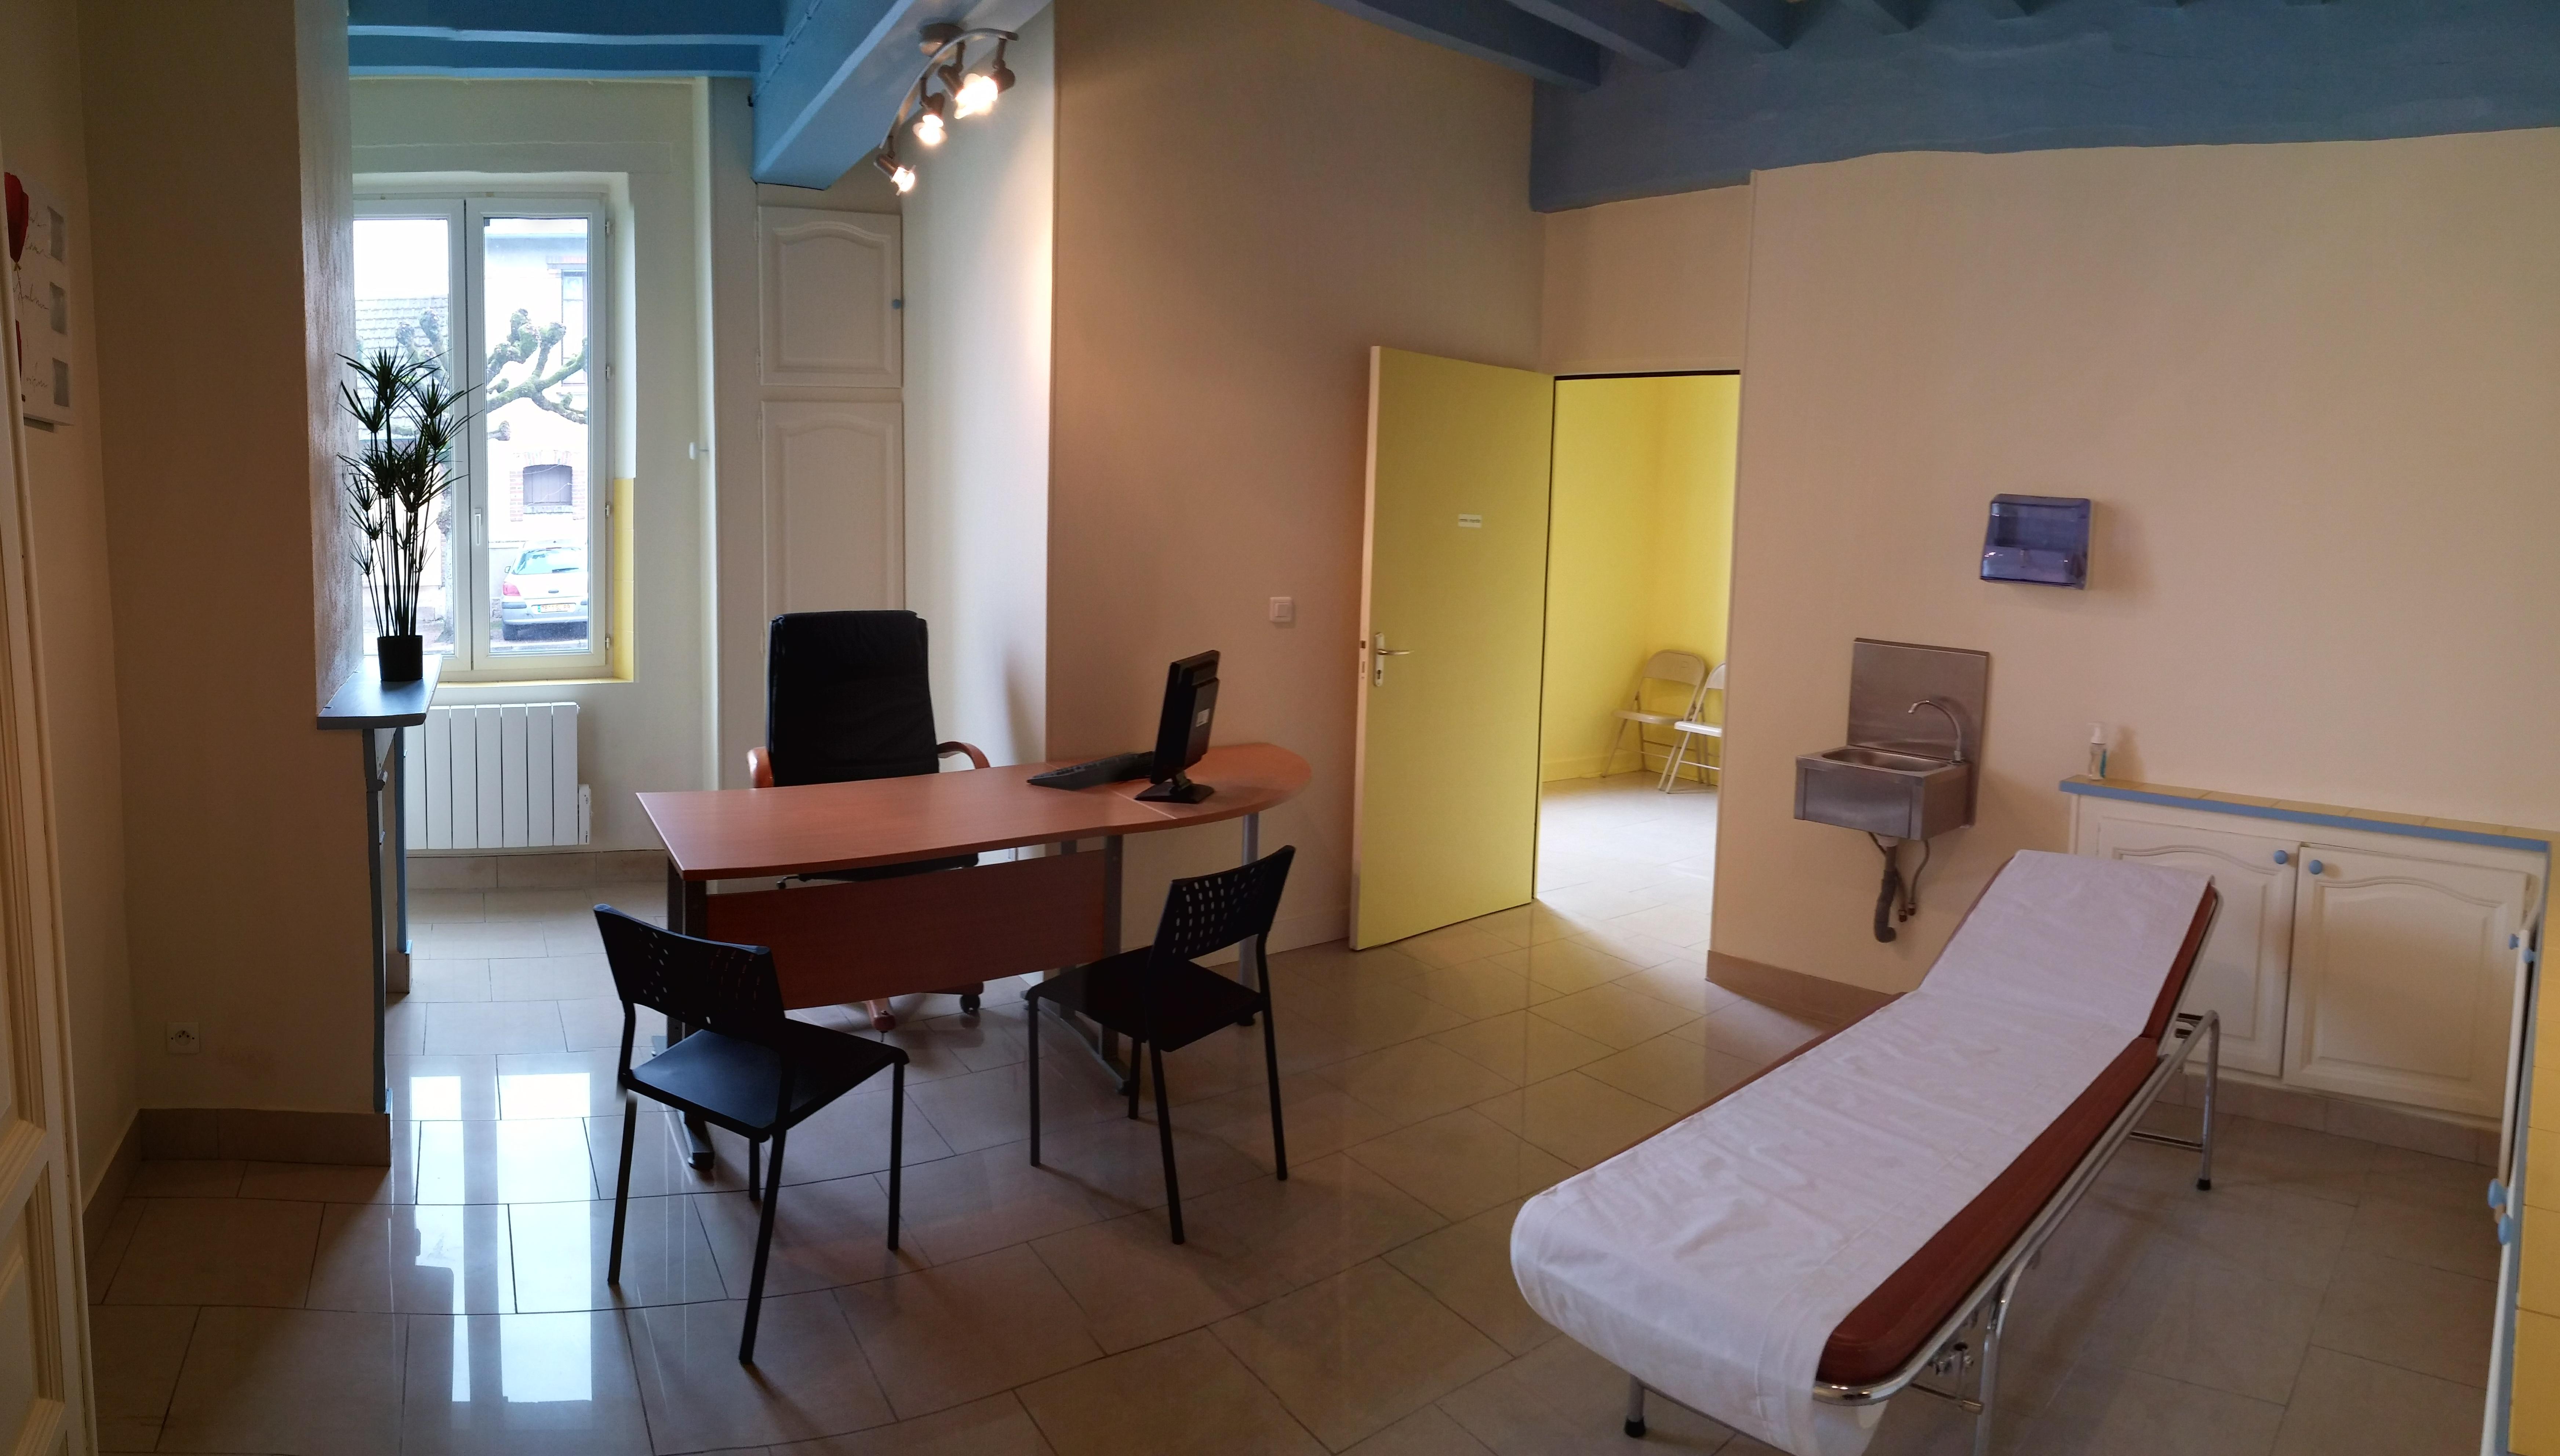 Accessibilite des cabinets medicaux - Accessibilite cabinet medical ...